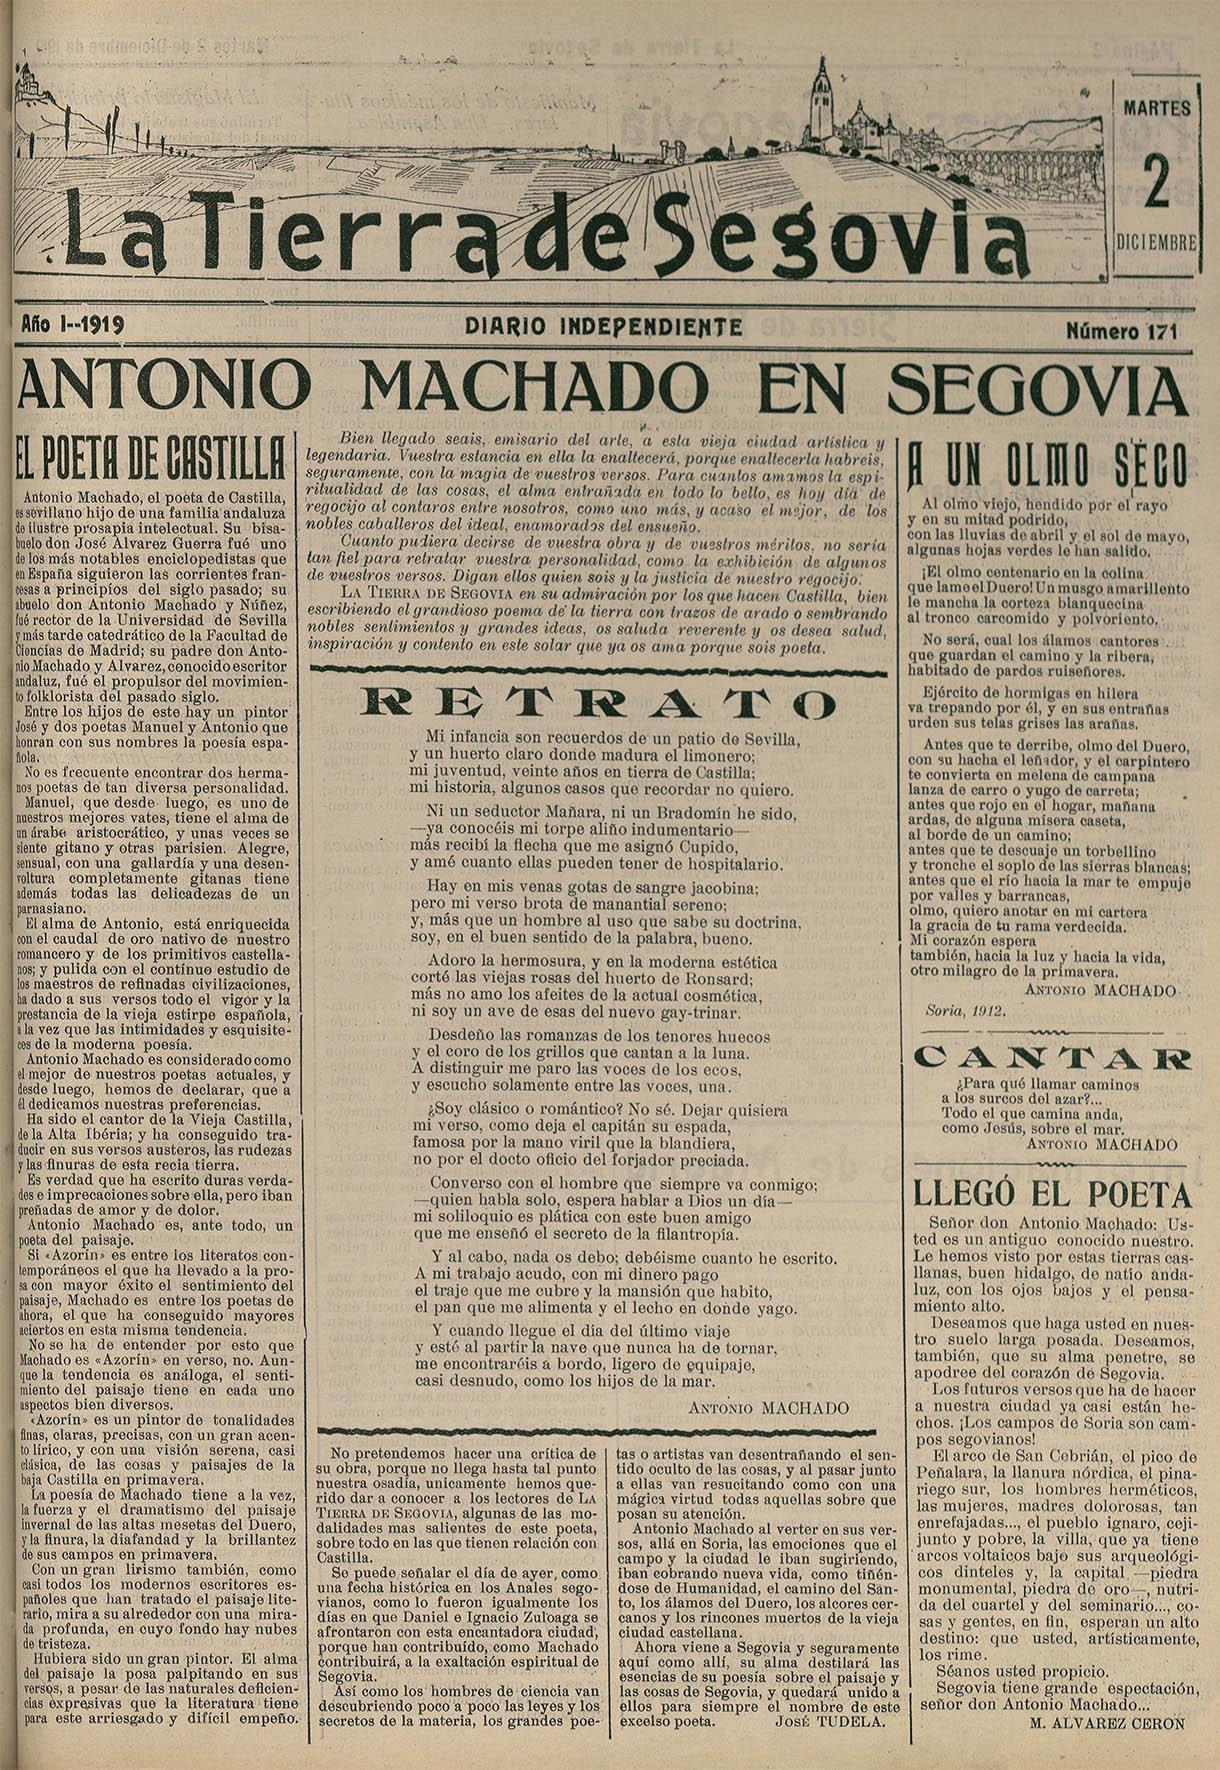 PAG 1 LA TIERRA DE SEGOVIA - Antonio Machado en Segovia. Vida y Obra